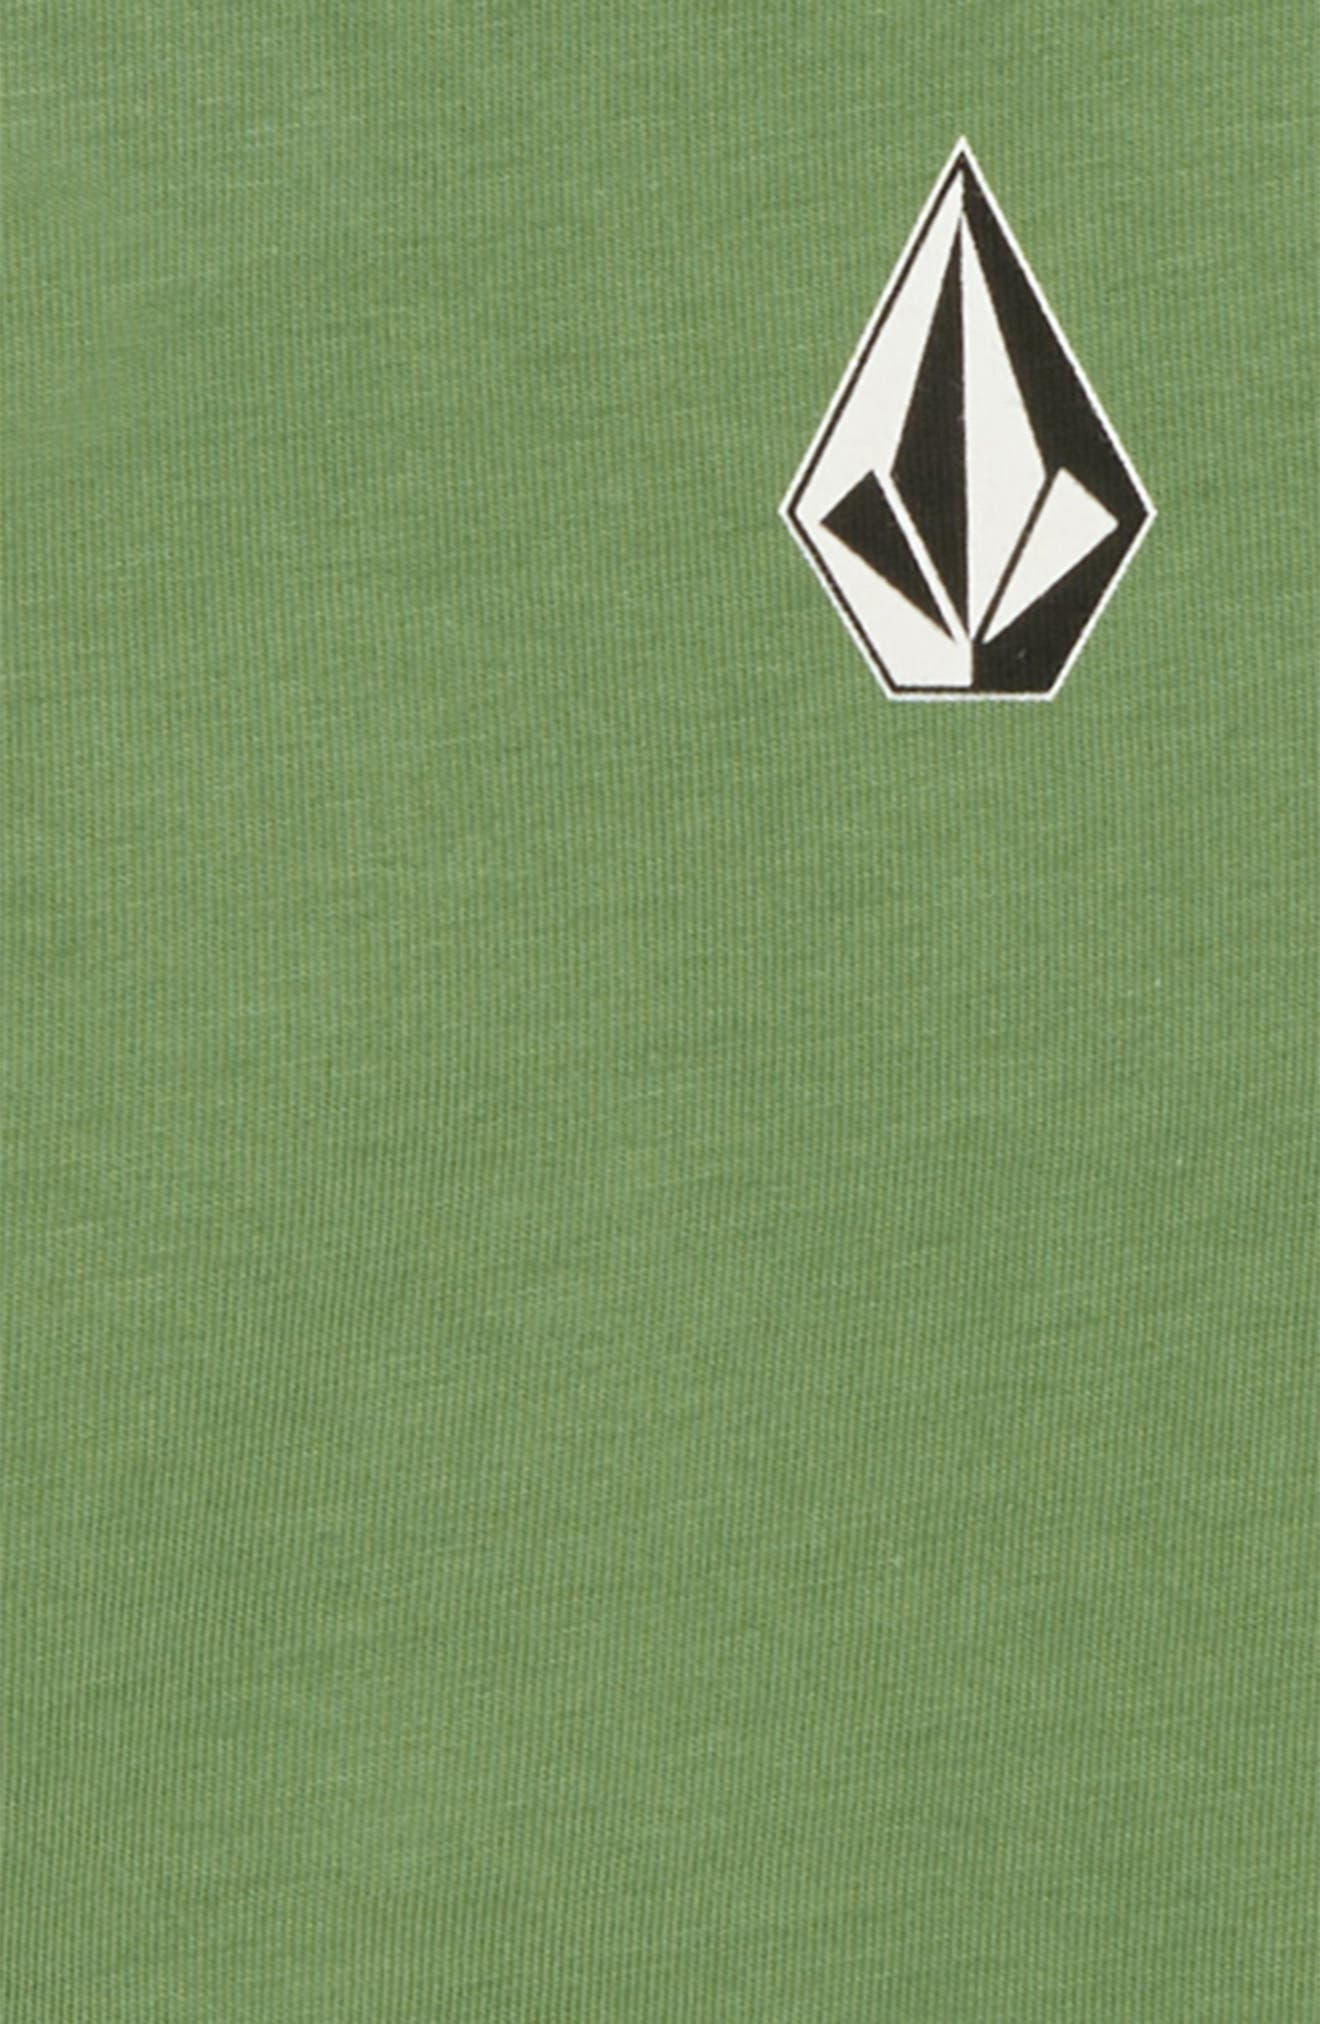 Deadlystones Graphic Long Sleeve T-Shirt,                             Alternate thumbnail 2, color,                             DARK KELLY